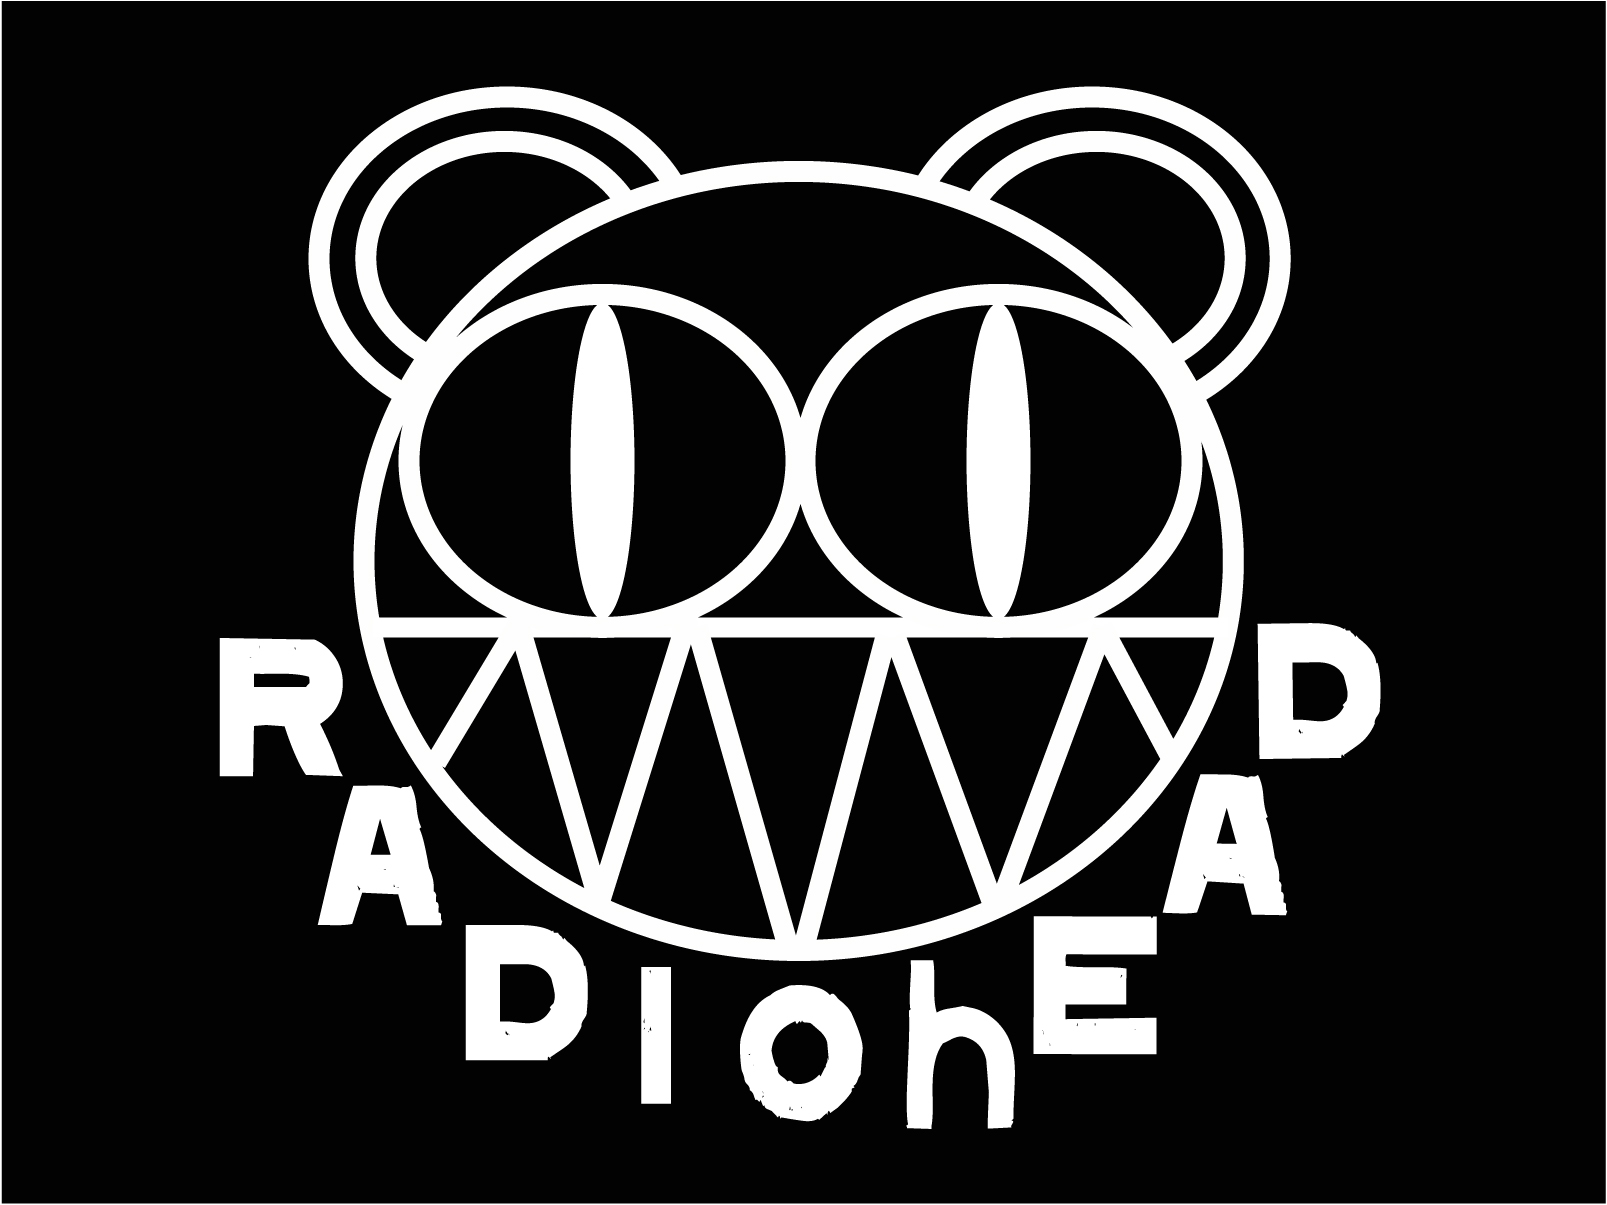 ВСтамбуле избили почитателей Radiohead